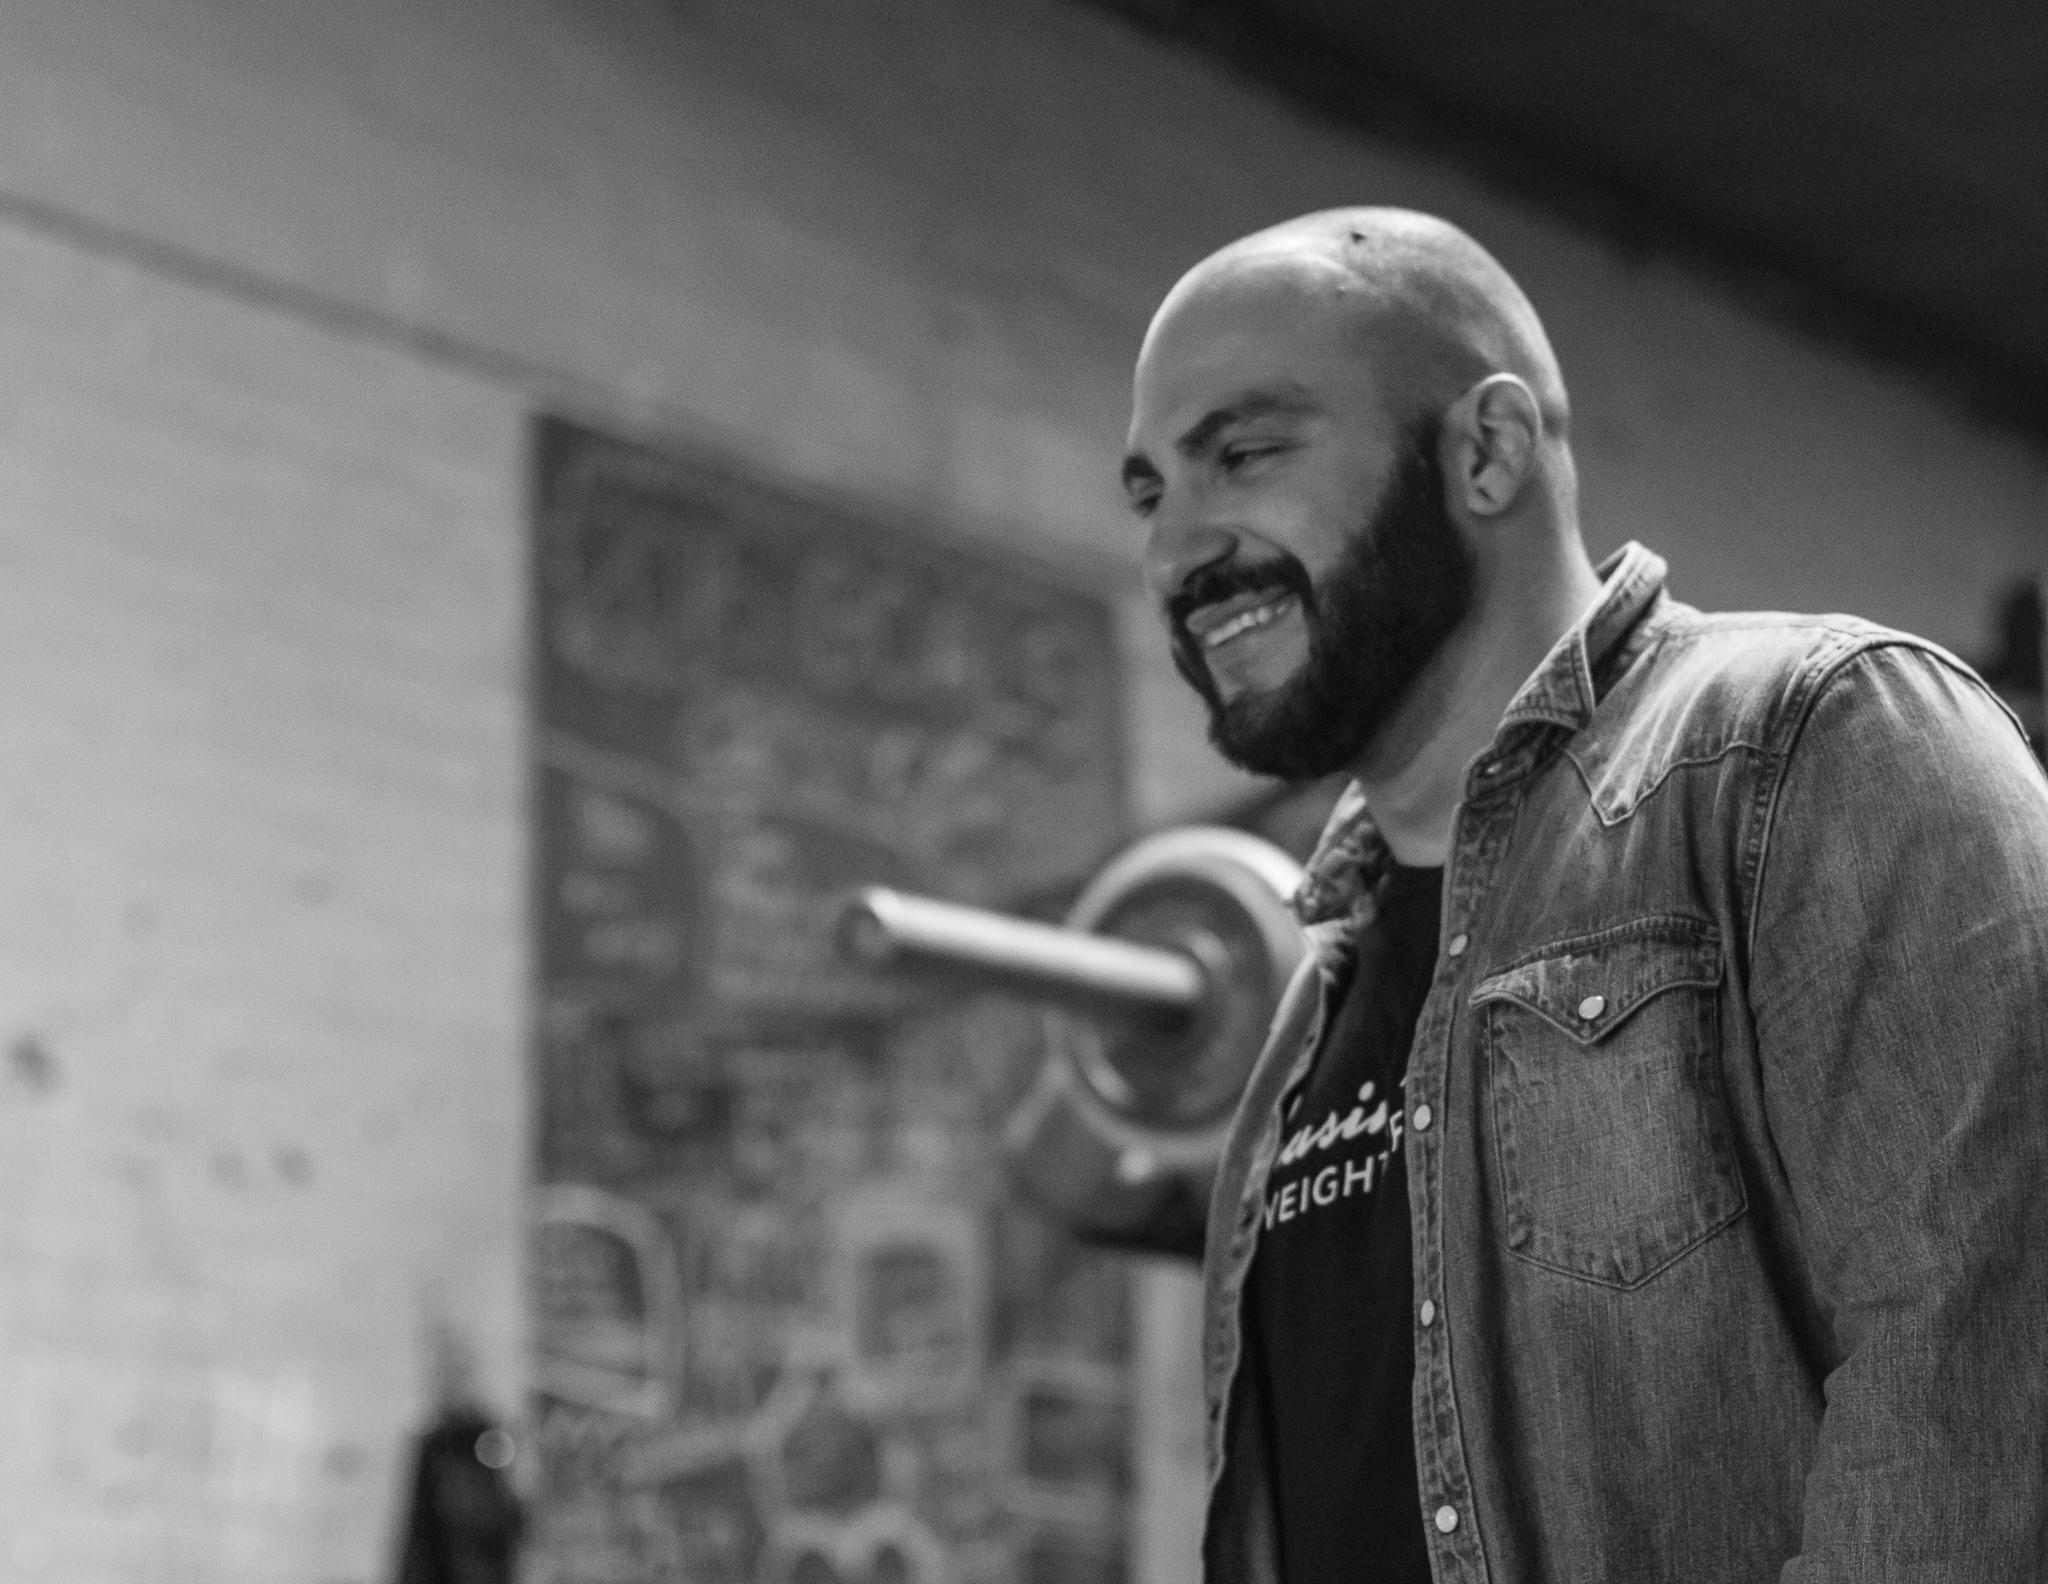 james-wright-visit-brooklyn-new-york-weightlifting-coach-teammates-october-2016 (4 of 92).jpg